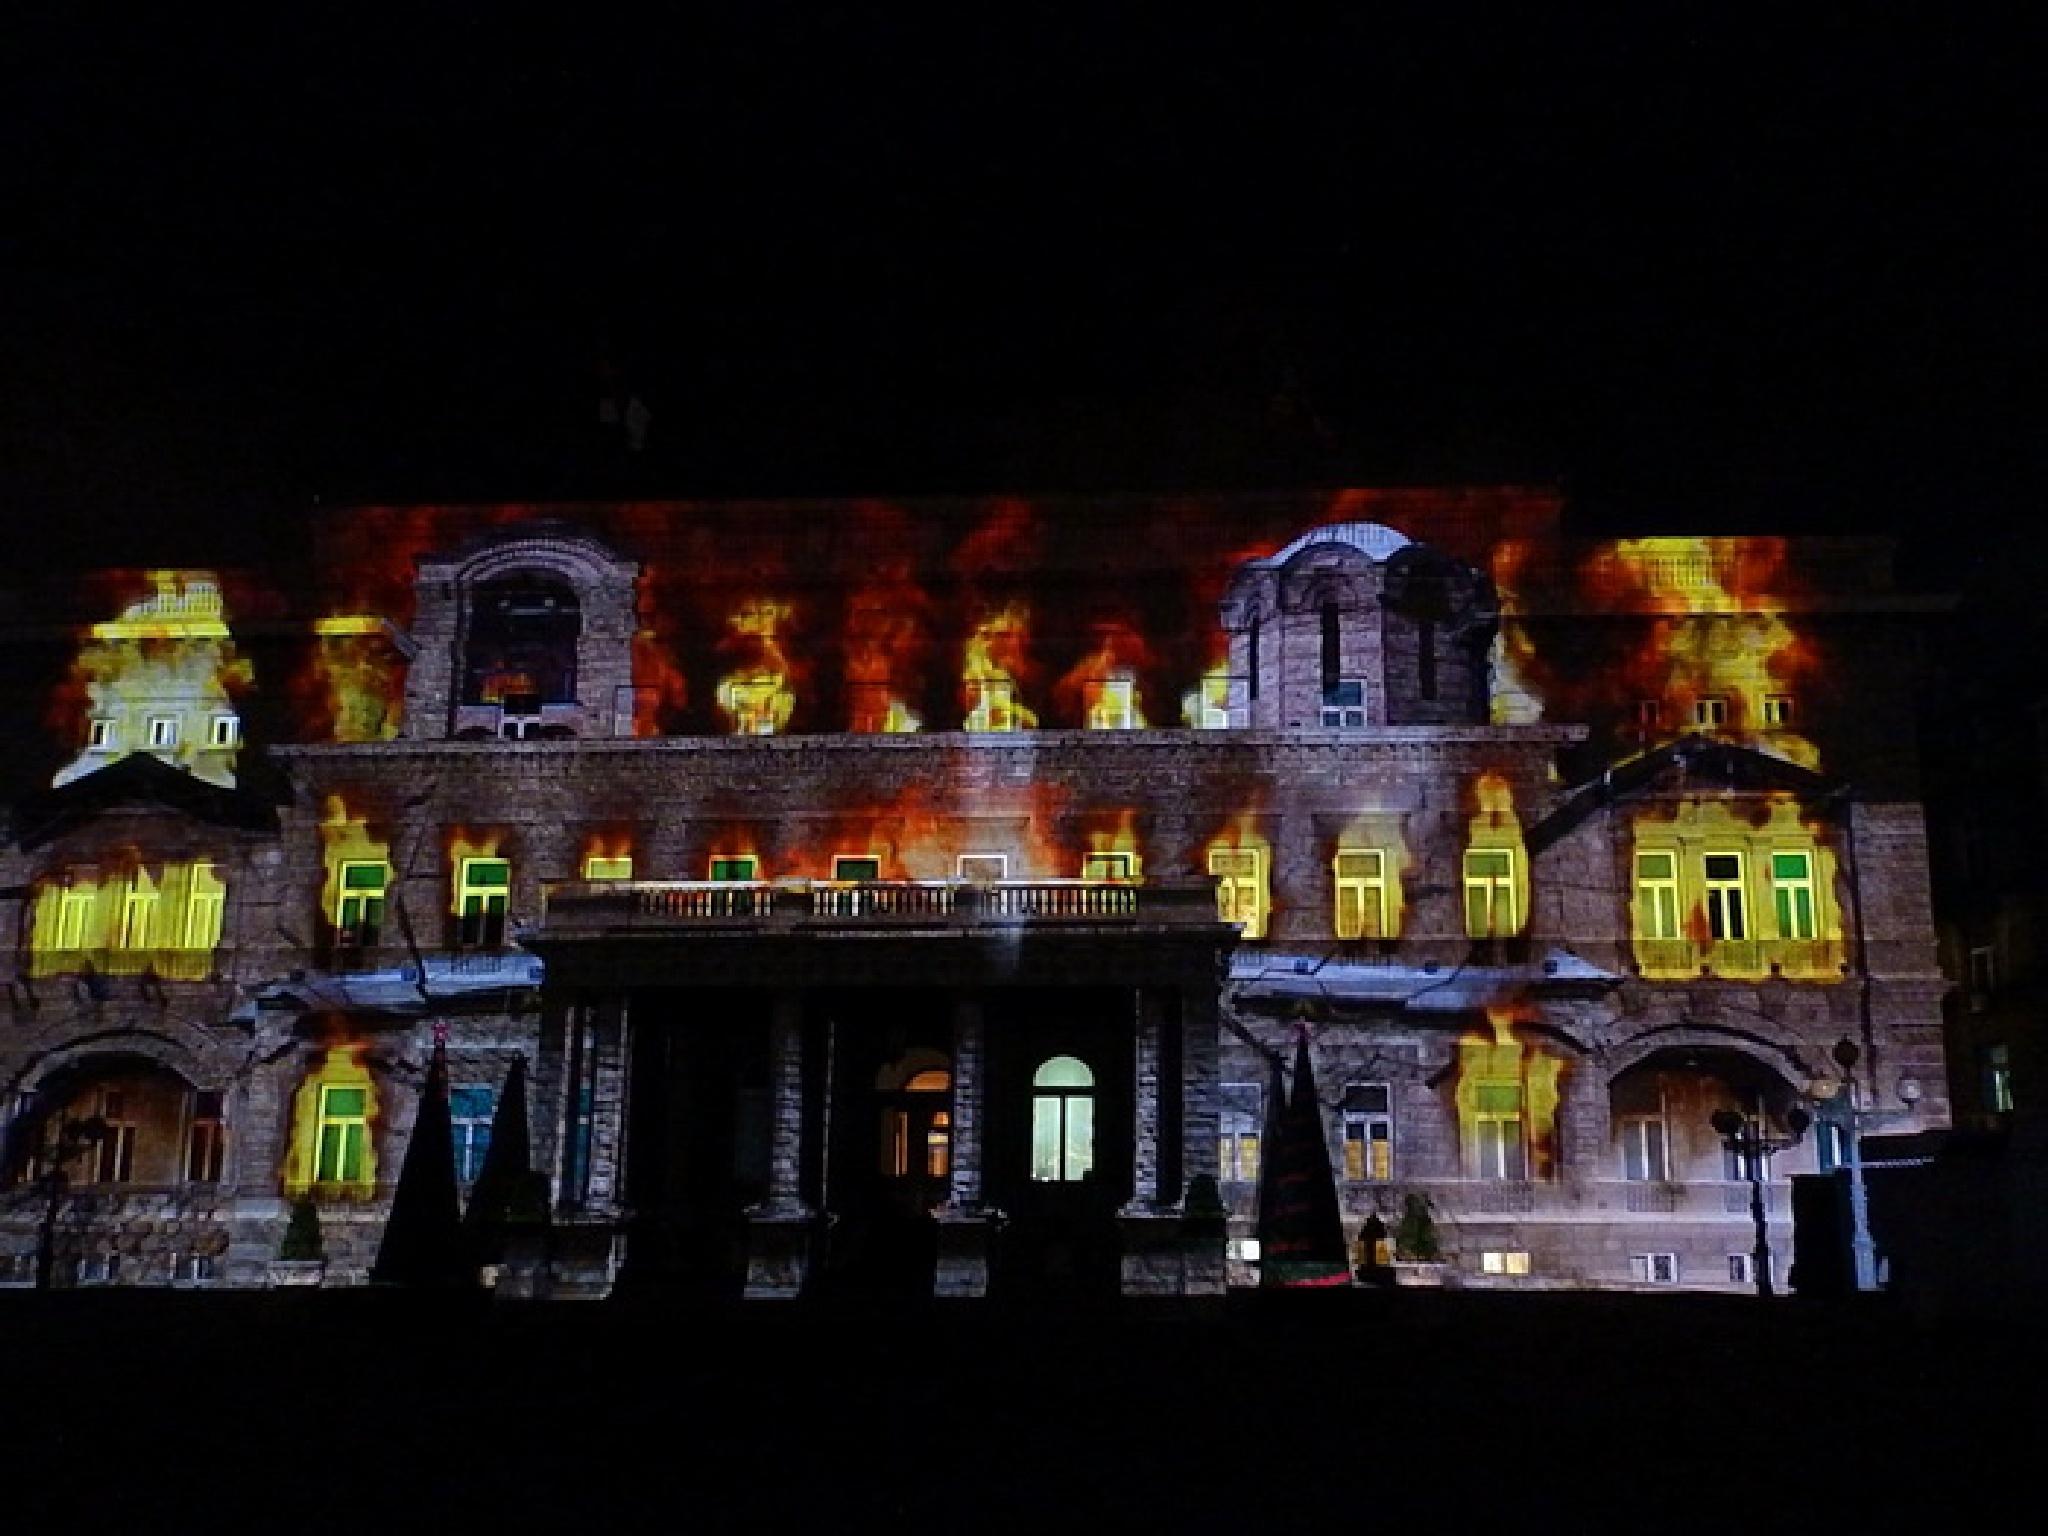 old palace i n Belgrade 3 by Vladimir Curcin